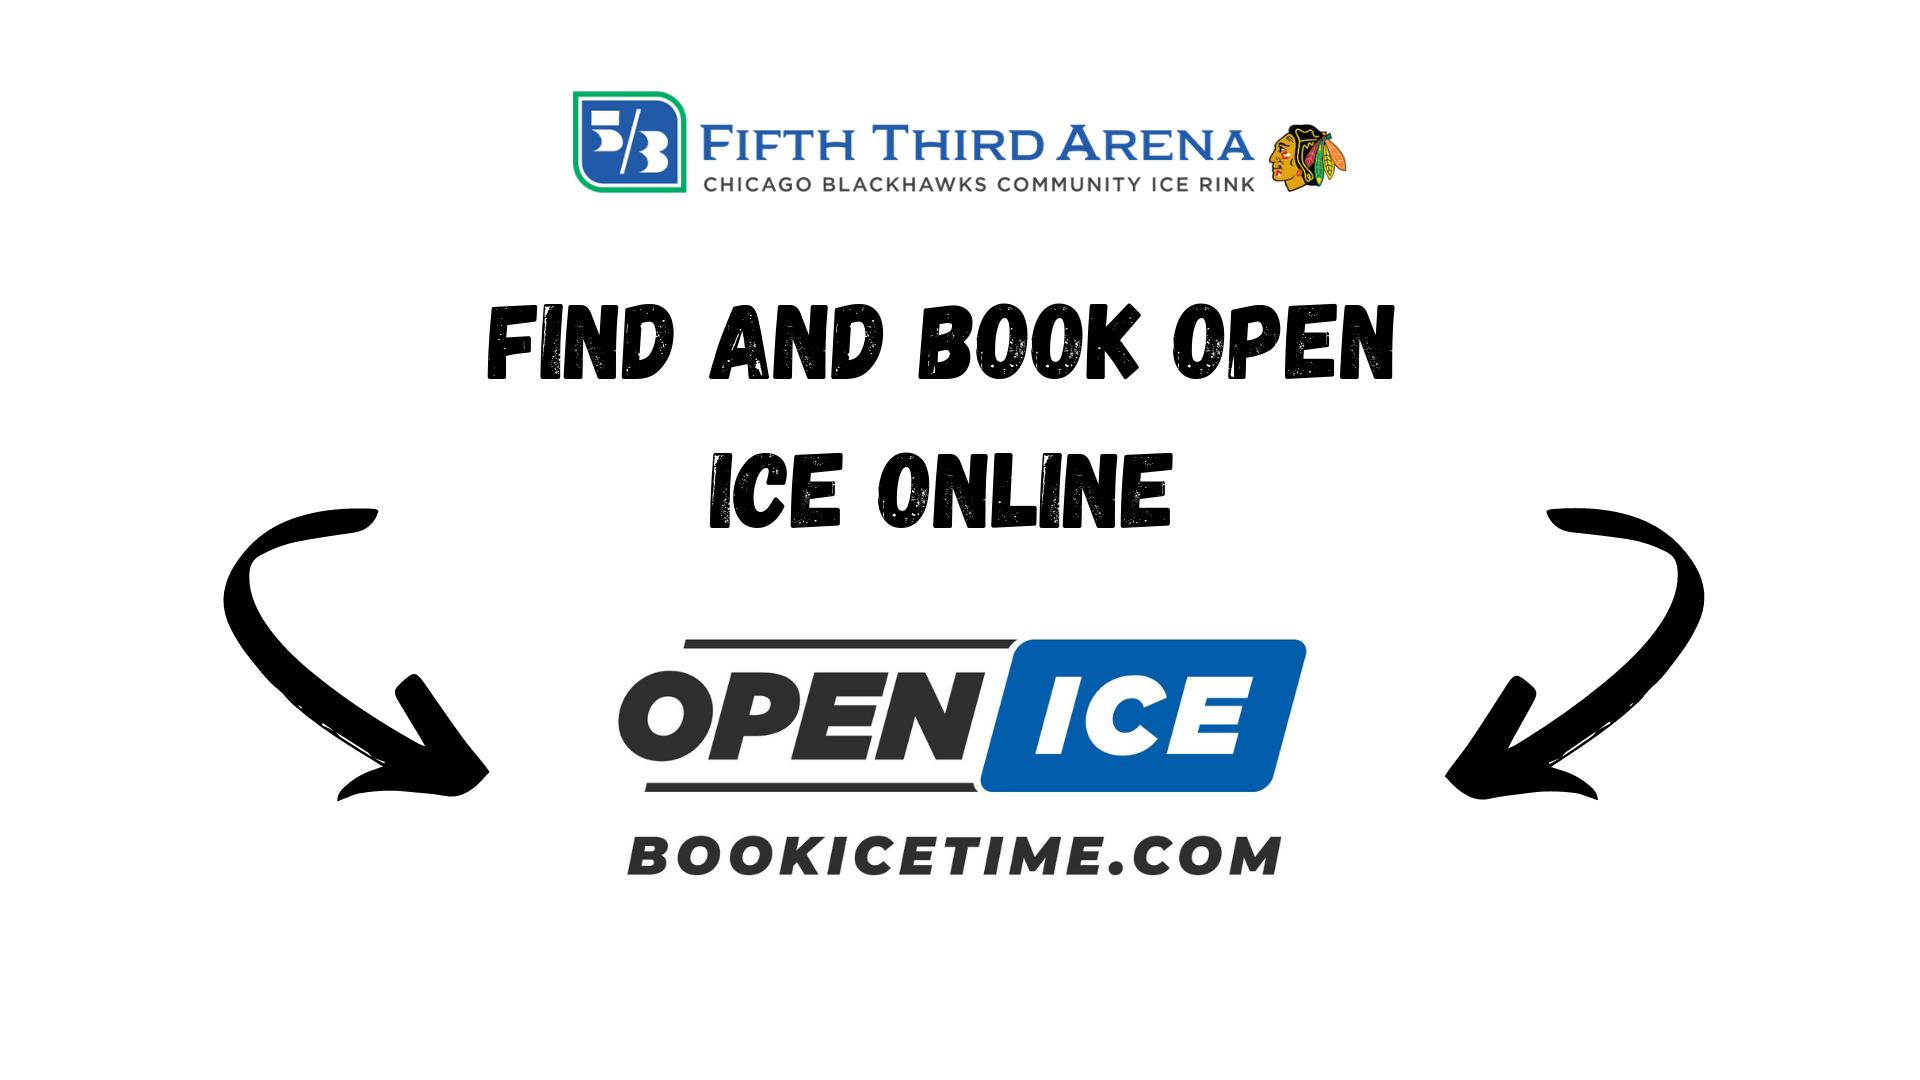 photograph regarding Chicago Blackhawks Printable Schedule named 5th 3rd Arena Chicago Blackhawks Neighborhood Ice Rink